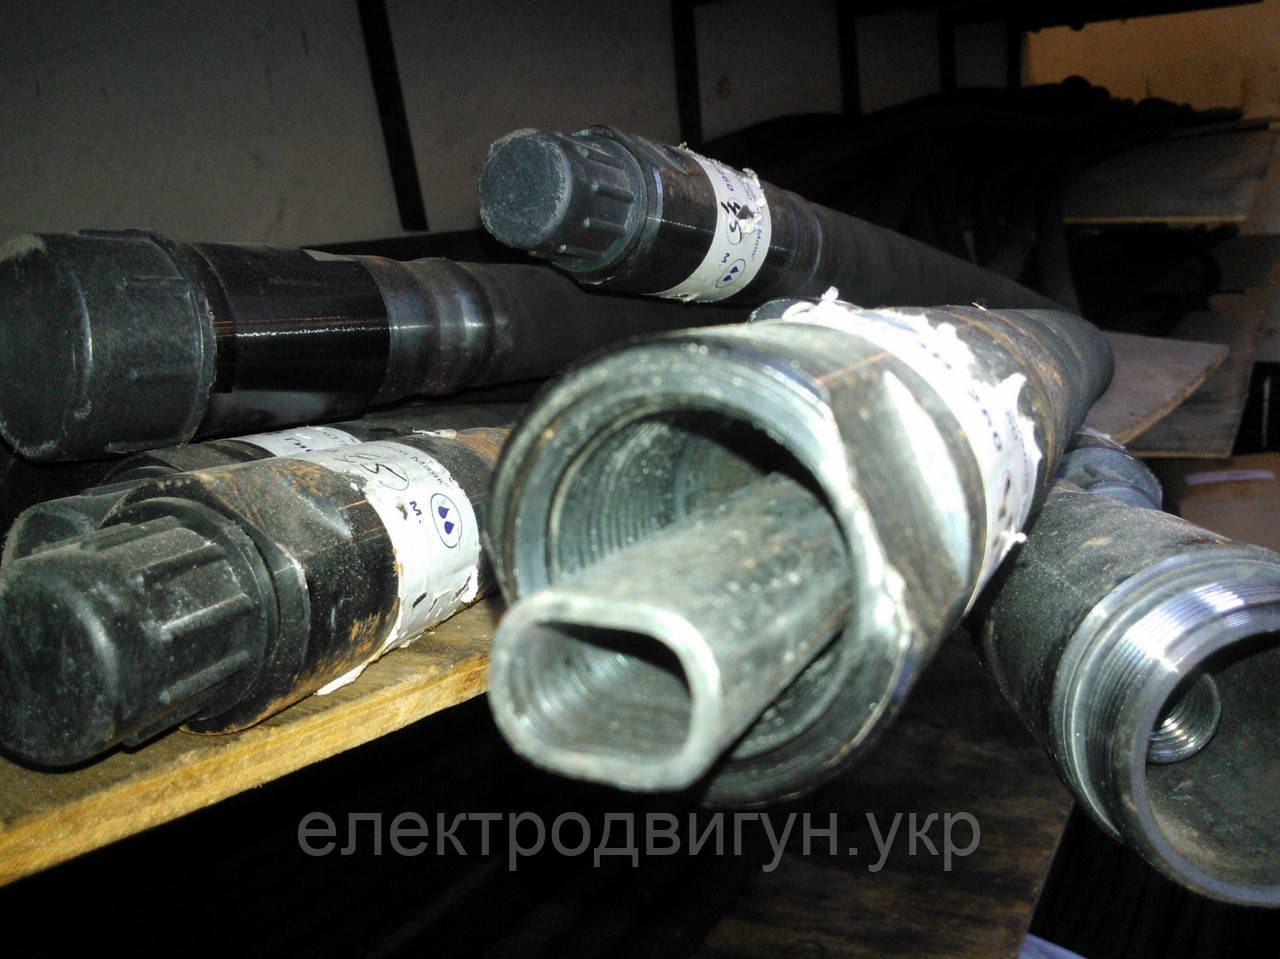 Гнучкий вал глибинного вібратора ЕВ-260.02 (ВС-400) 6м